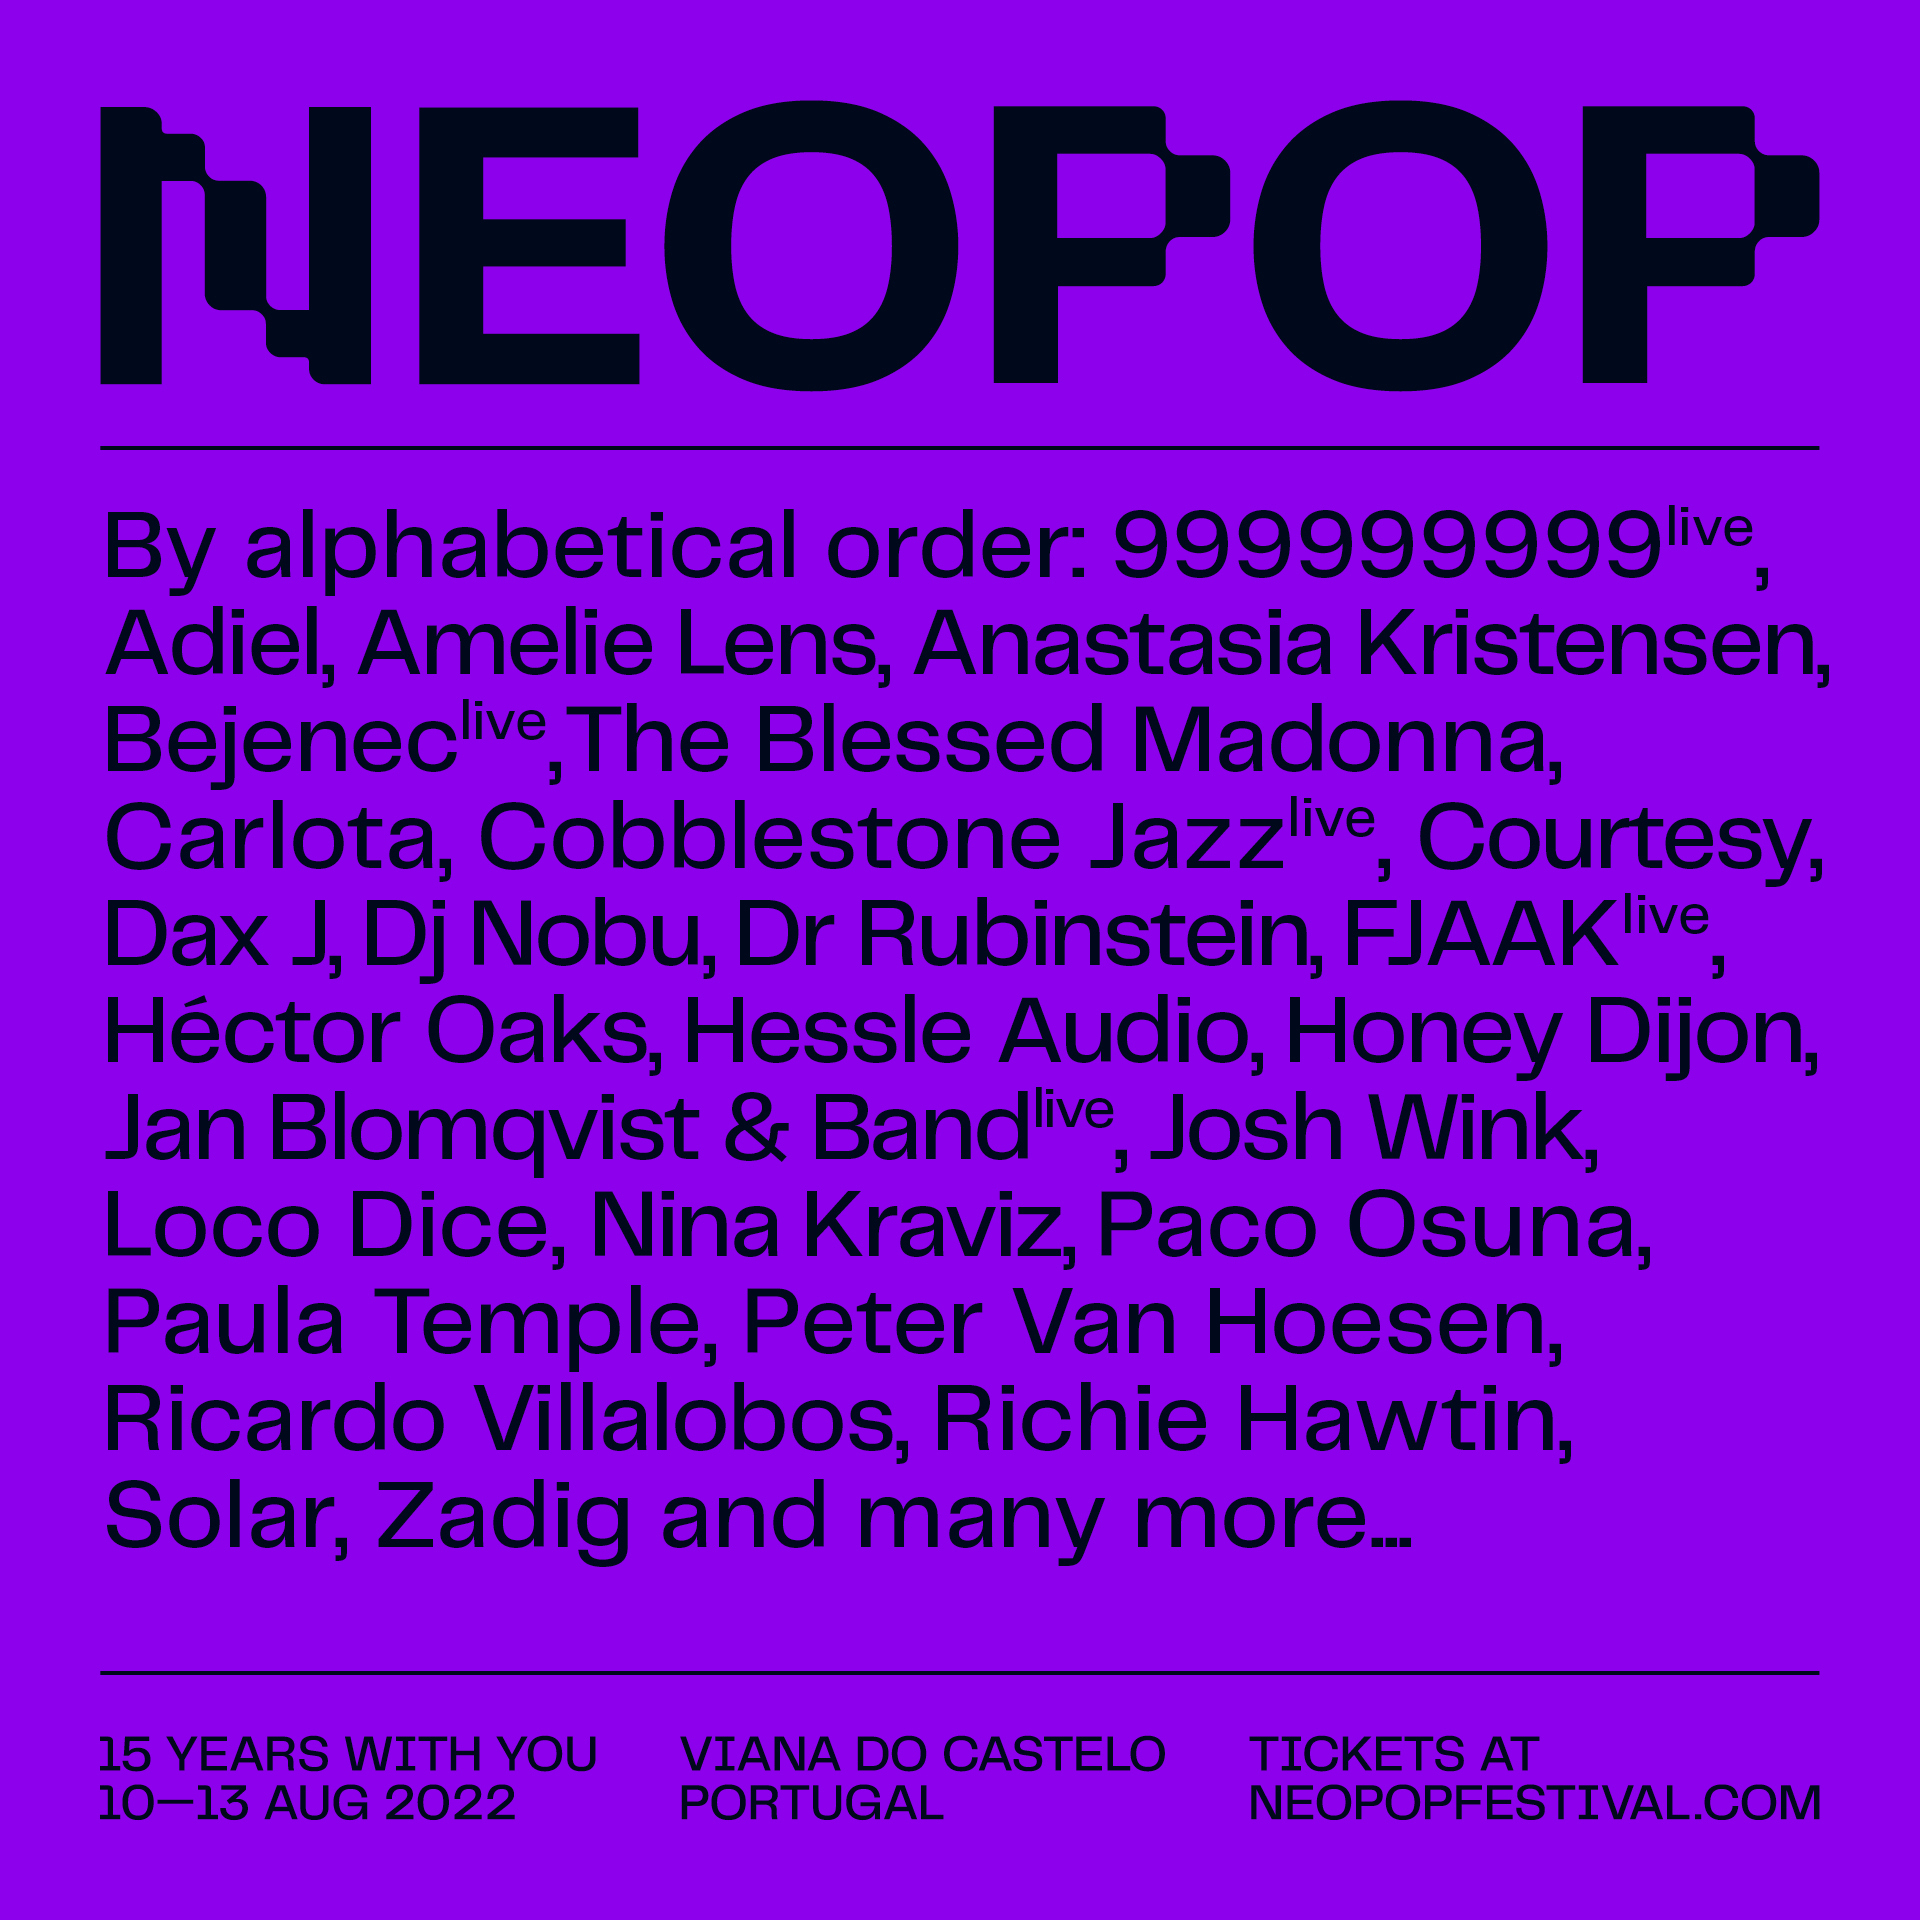 Neopop Festival 15 aniversario.